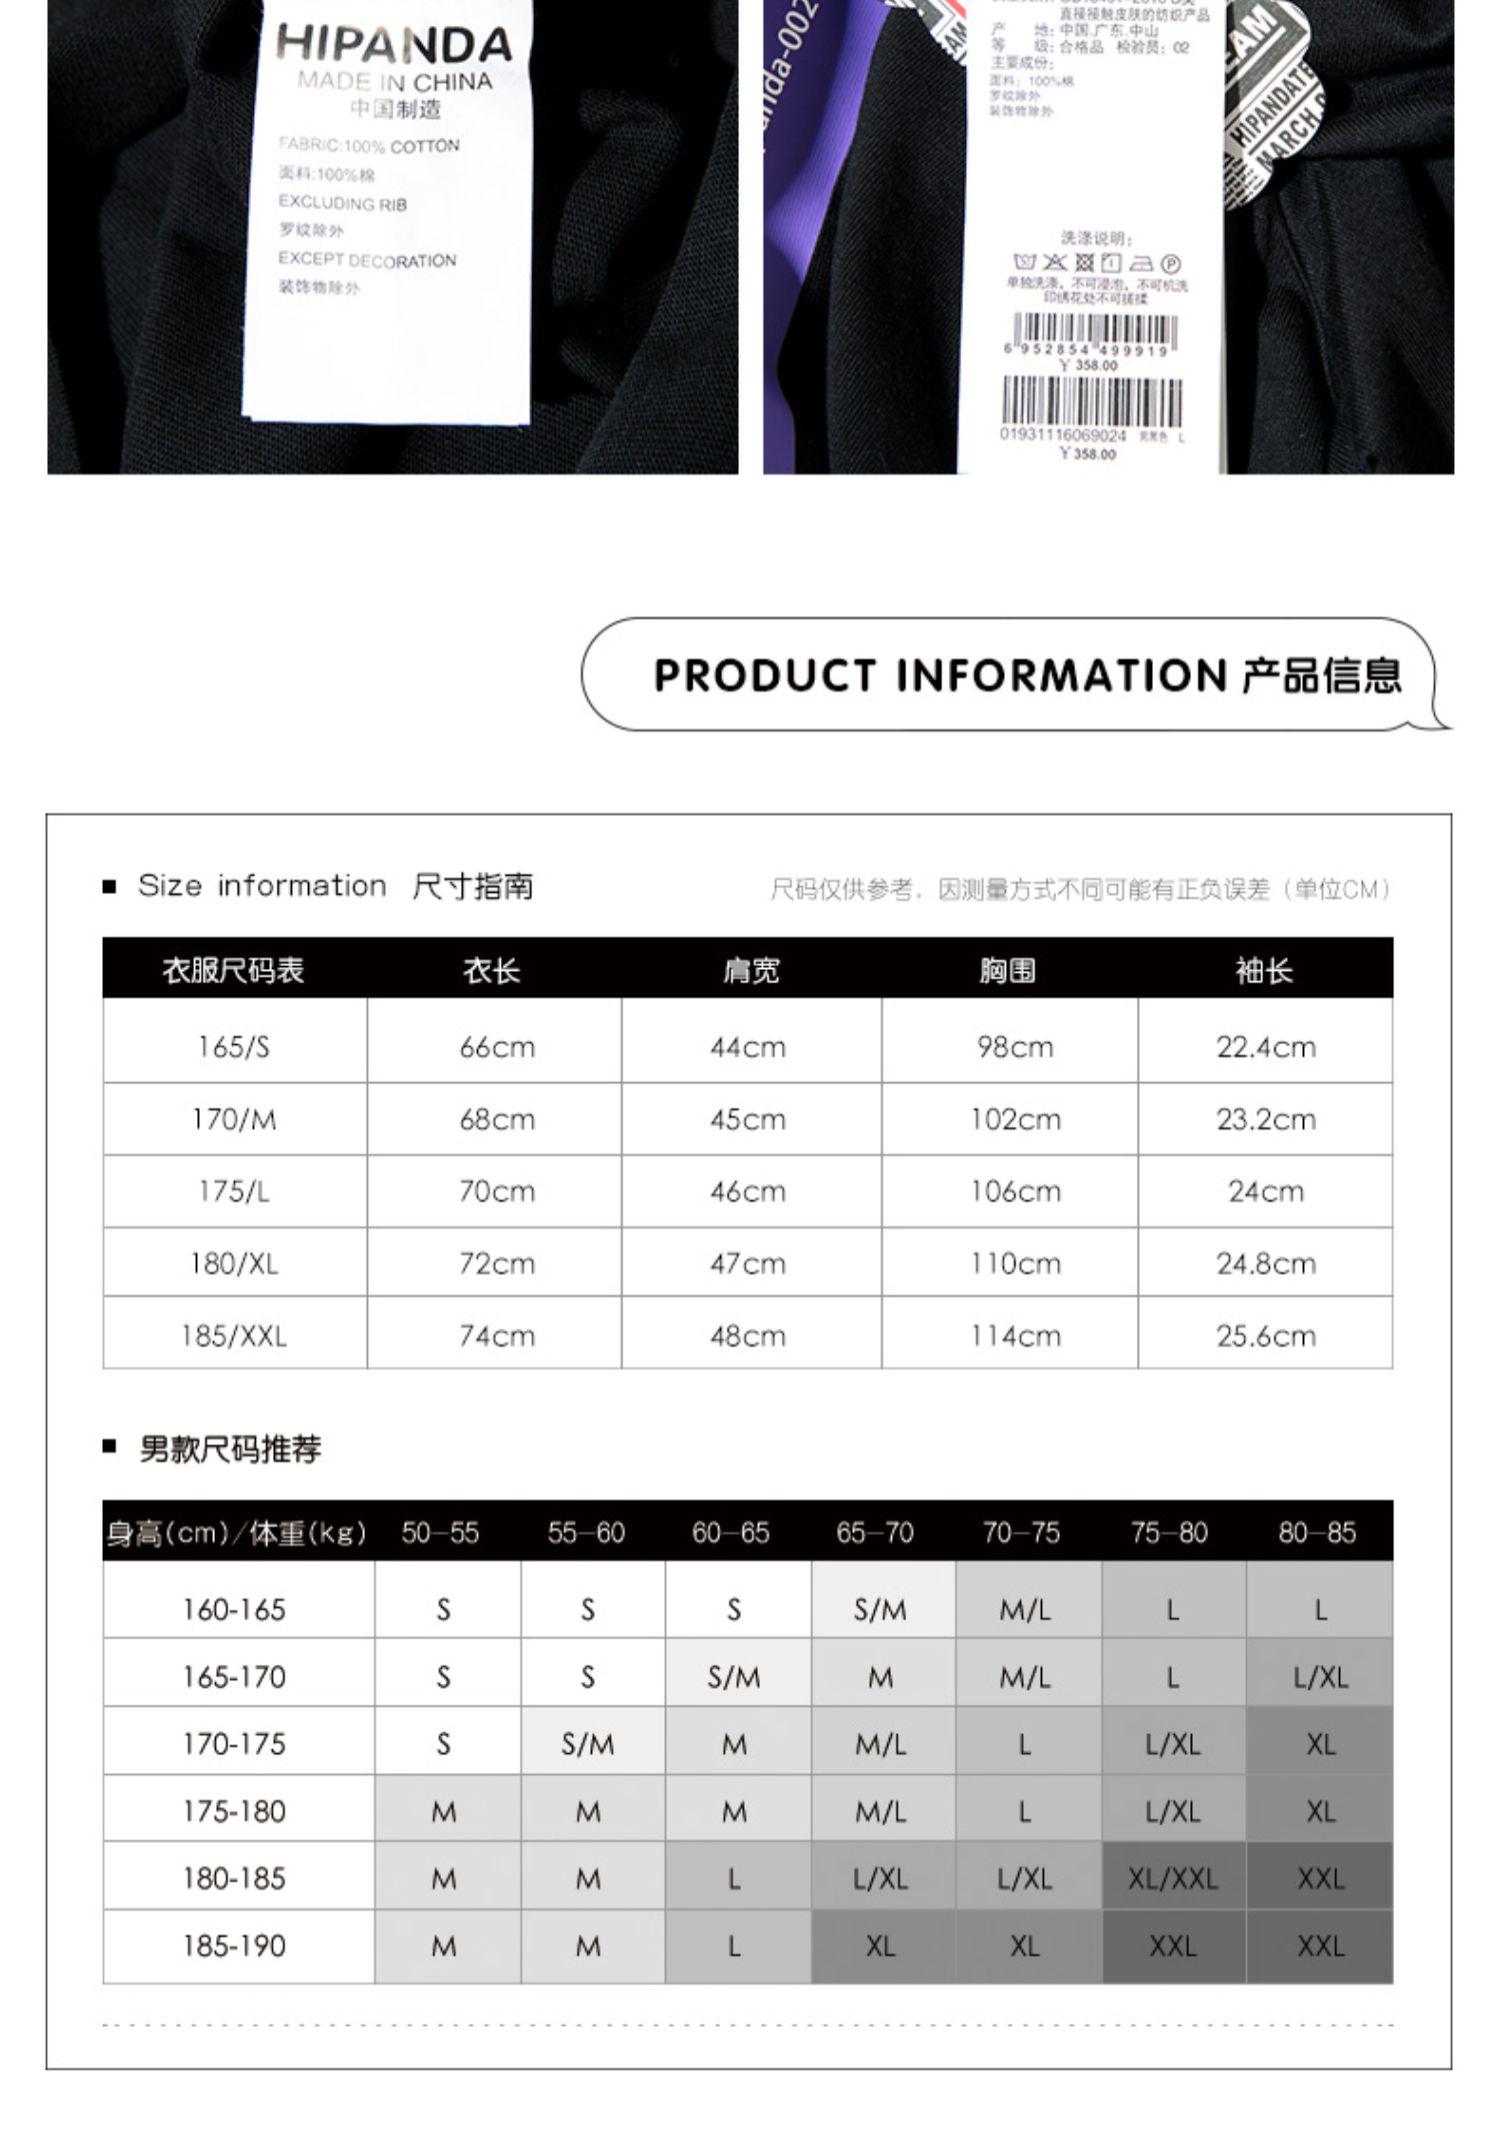 HIPANDA 你好熊猫 设计潮牌 男款 熊猫宇航员正脸紫色印花T恤商品详情图